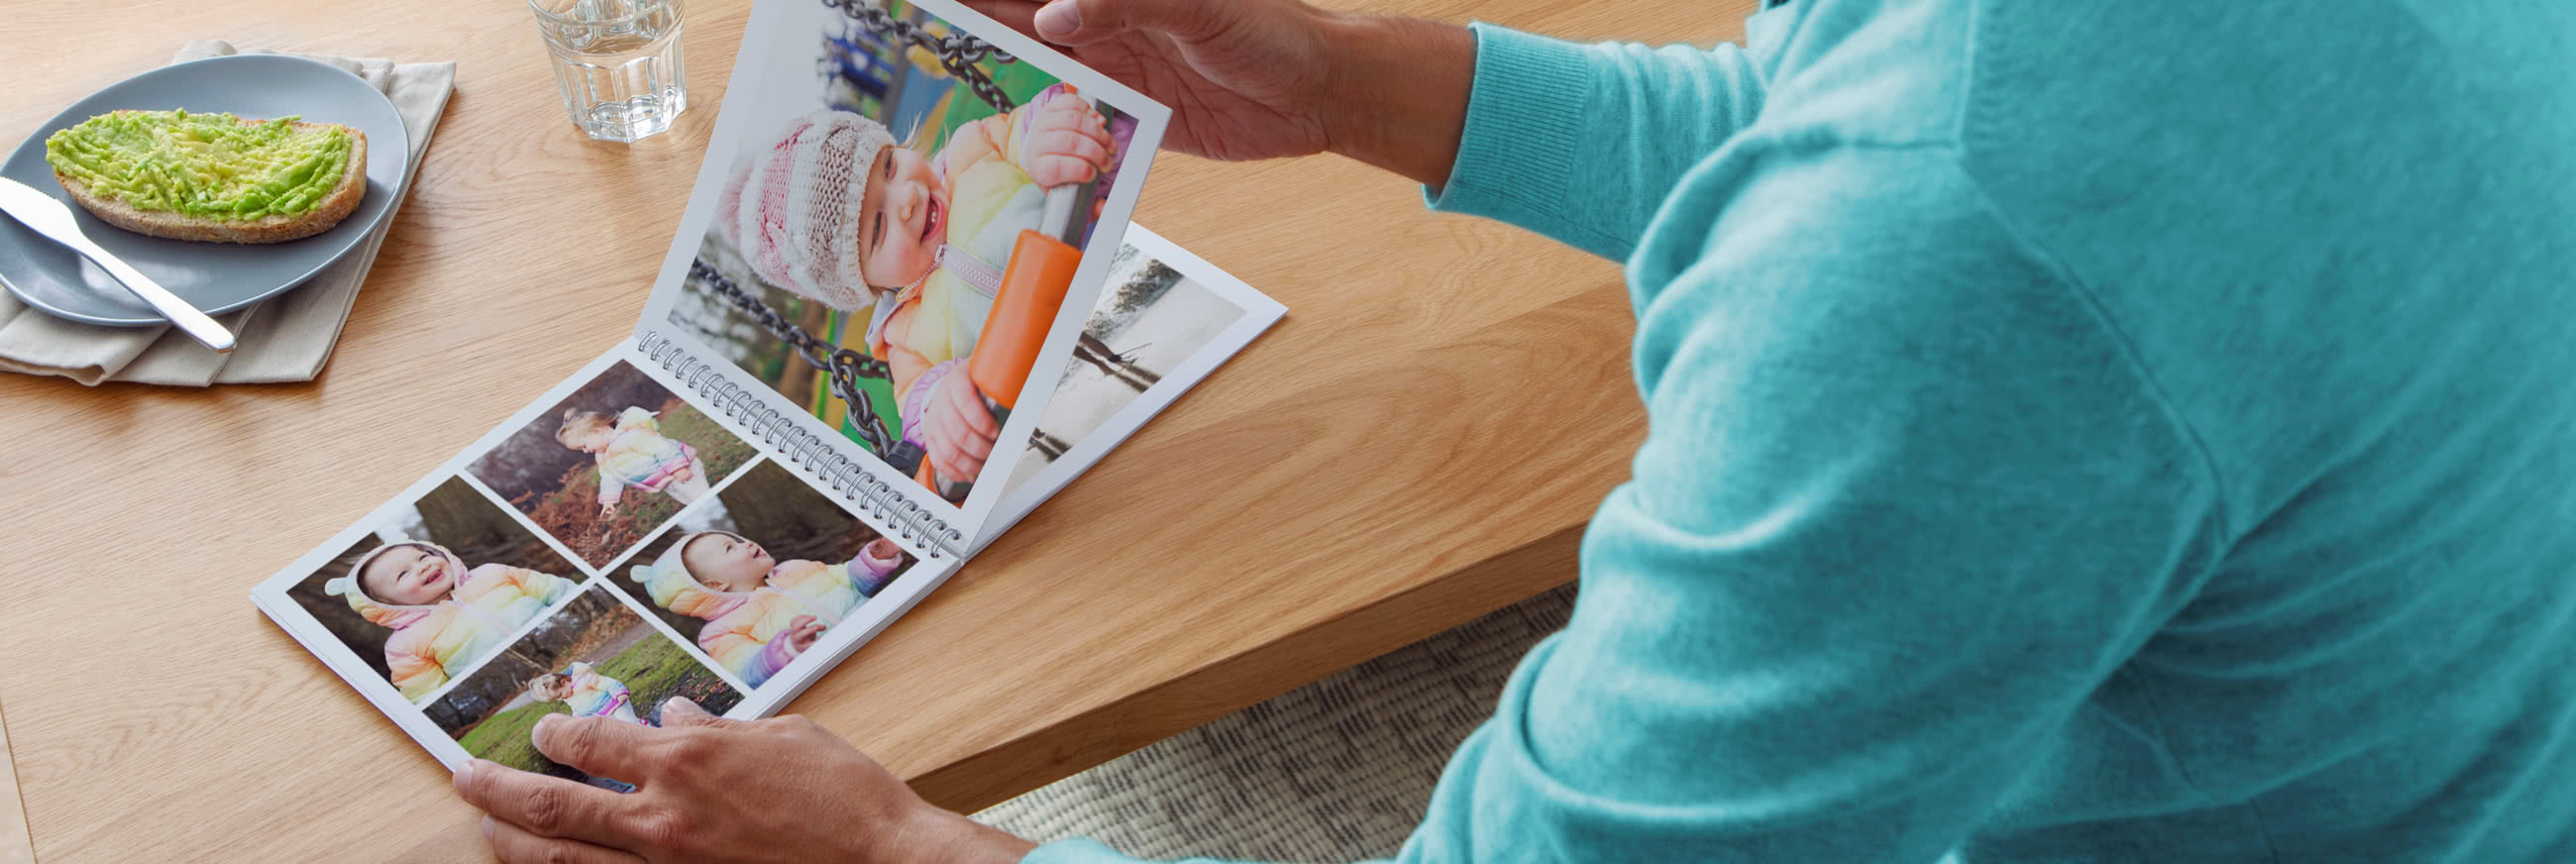 Softcover Square Spiral Photo Book